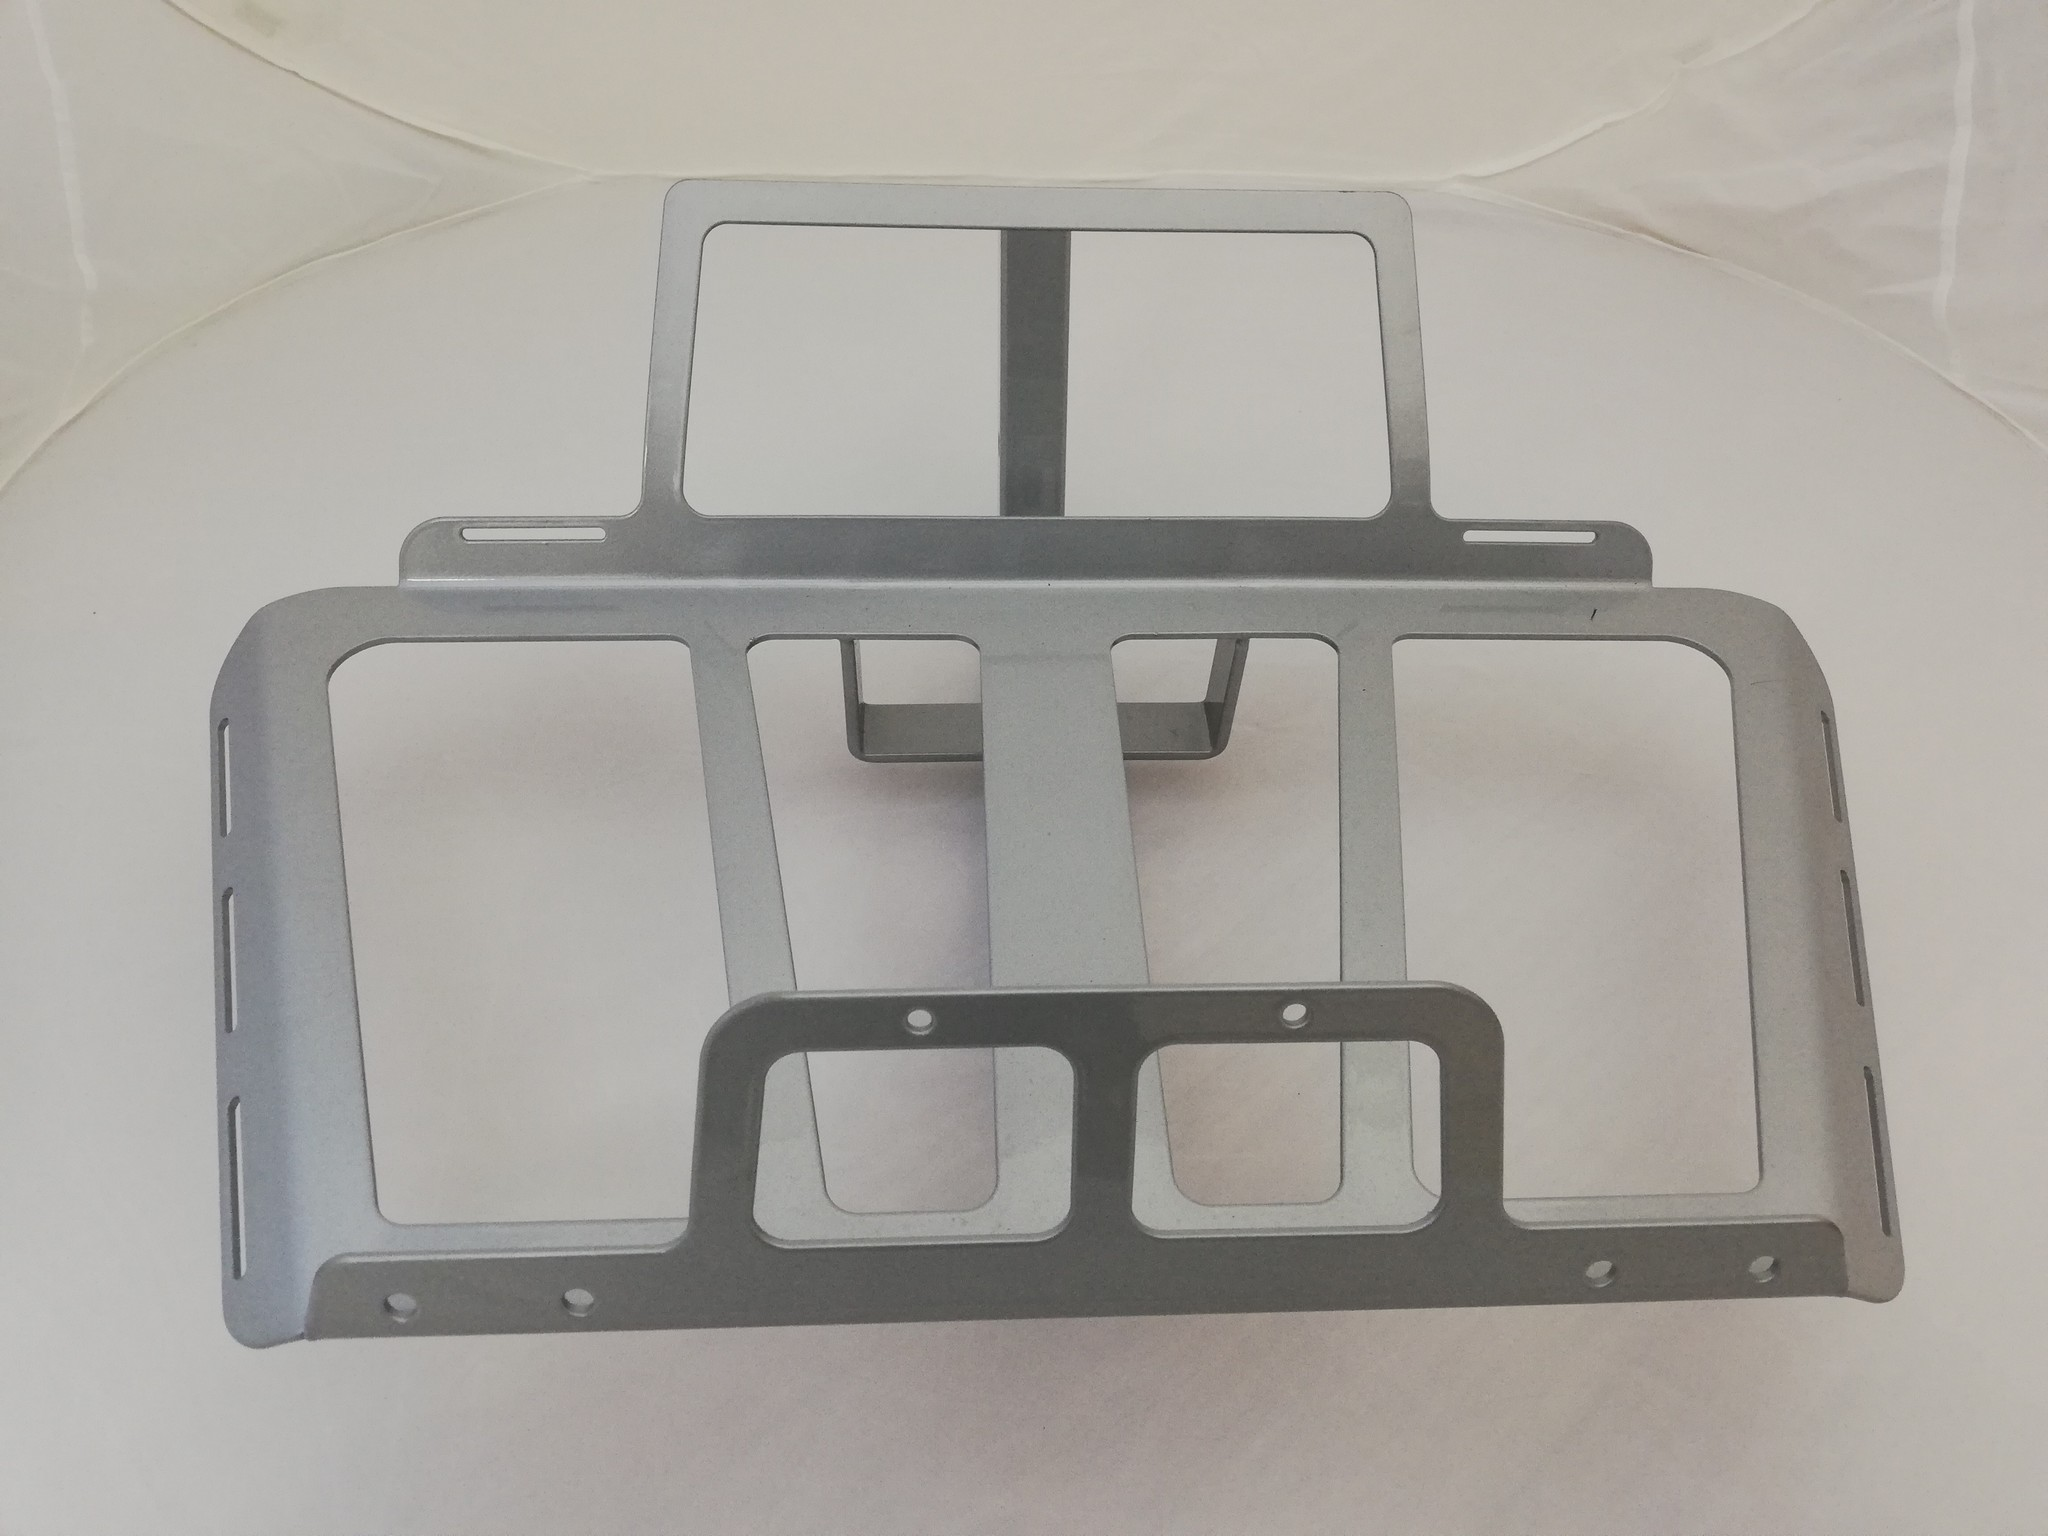 JVR Products Slide-in-Träger GL 1800 model 2018 silbergrau